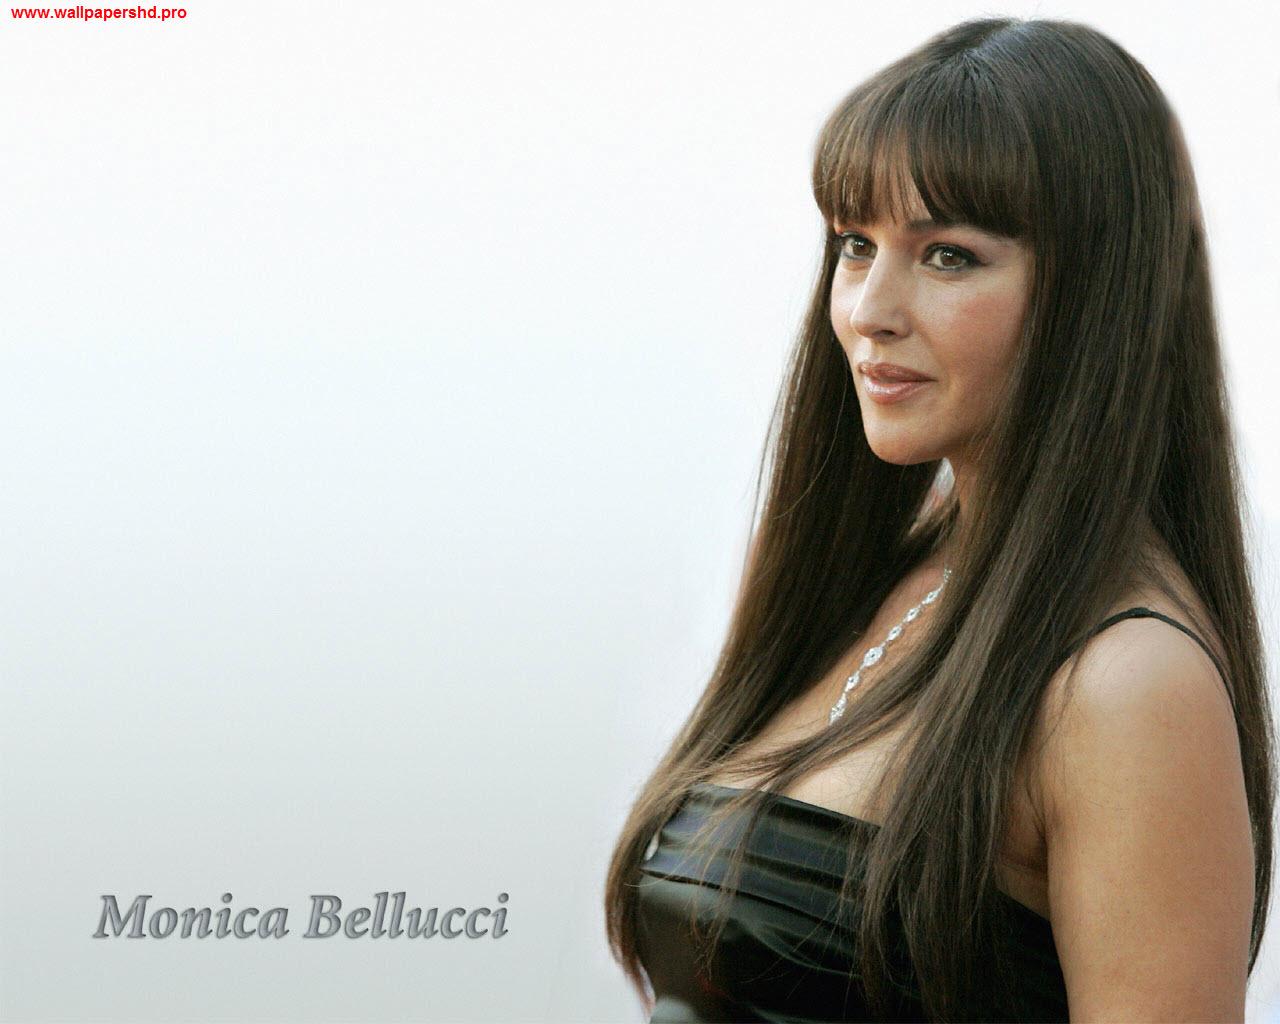 http://1.bp.blogspot.com/-v02divFahCs/UKkqhLQg7fI/AAAAAAAASd8/nJuxH4C7qMs/s1600/Monica%20Bellucci%20(1).jpg